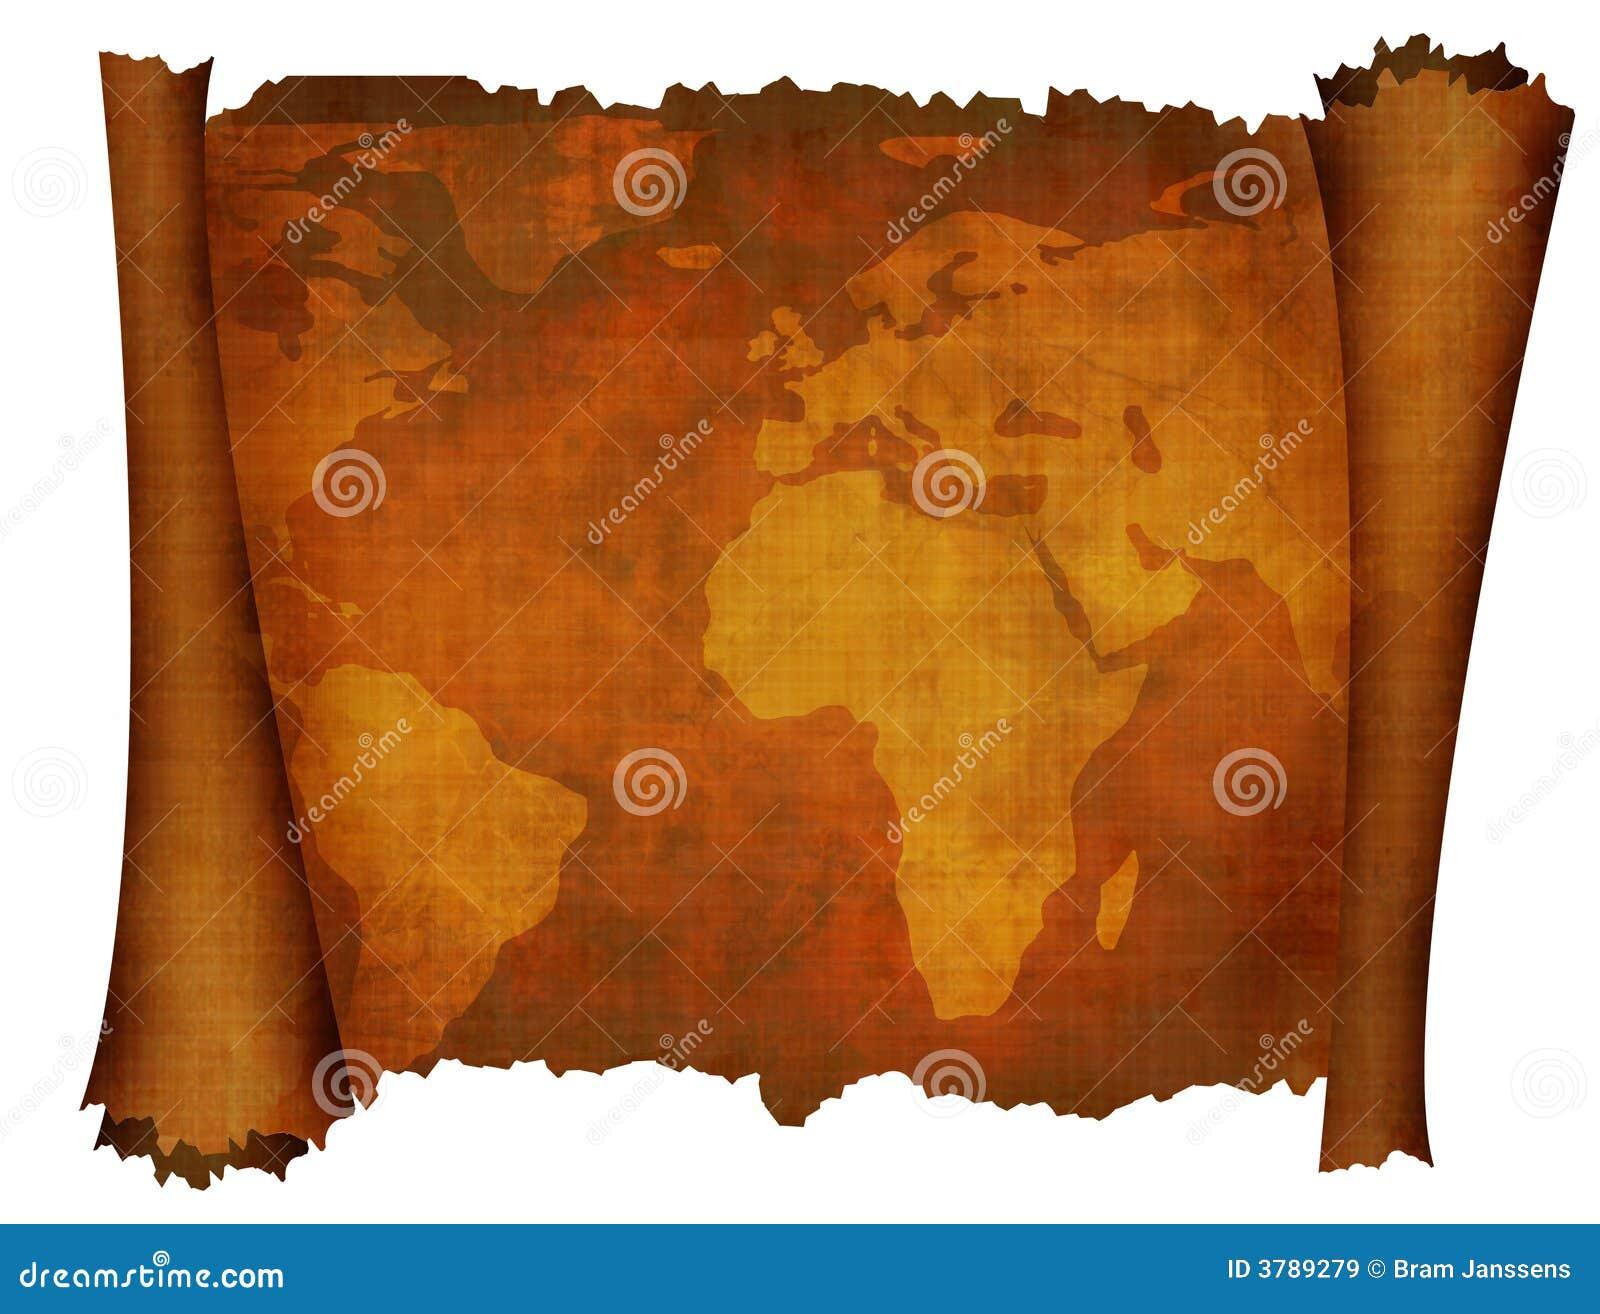 ancient global map royalty - photo #16